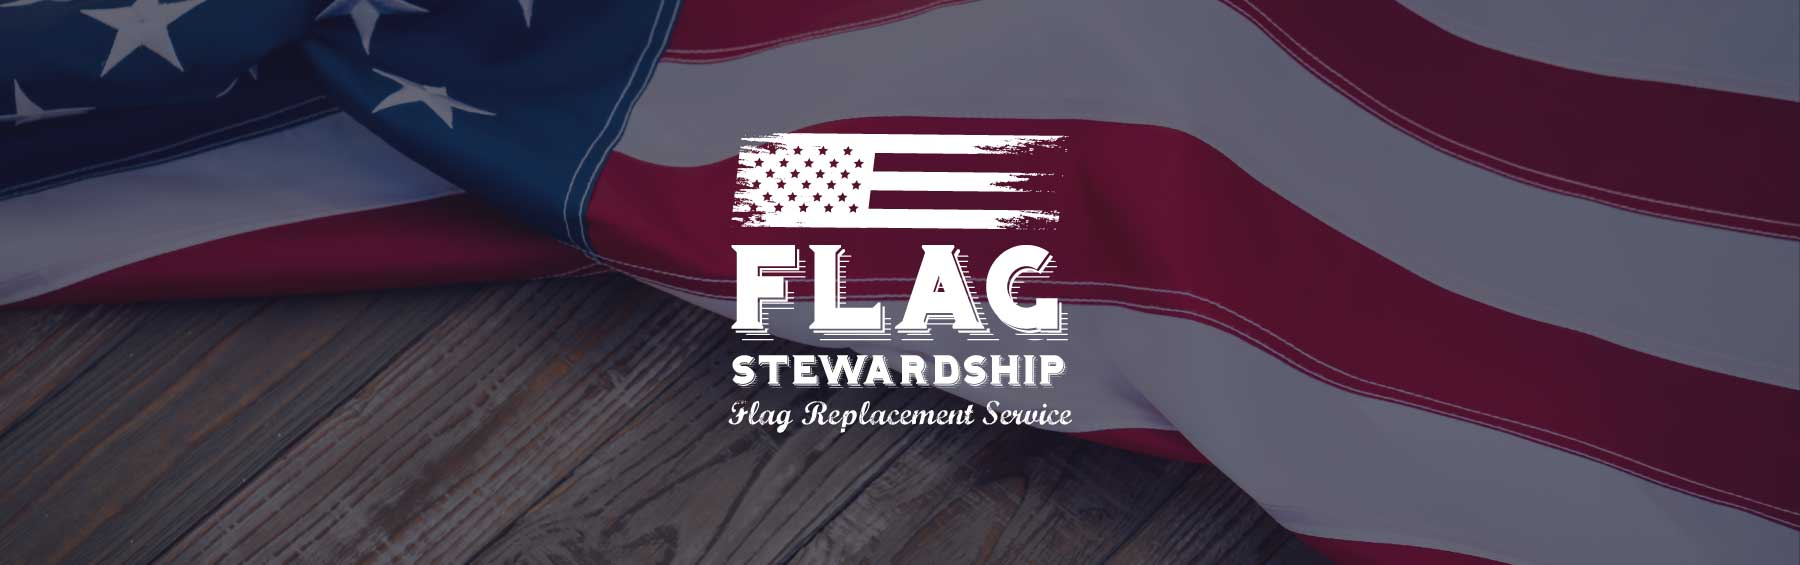 emf-stewardship-homepage.jpg